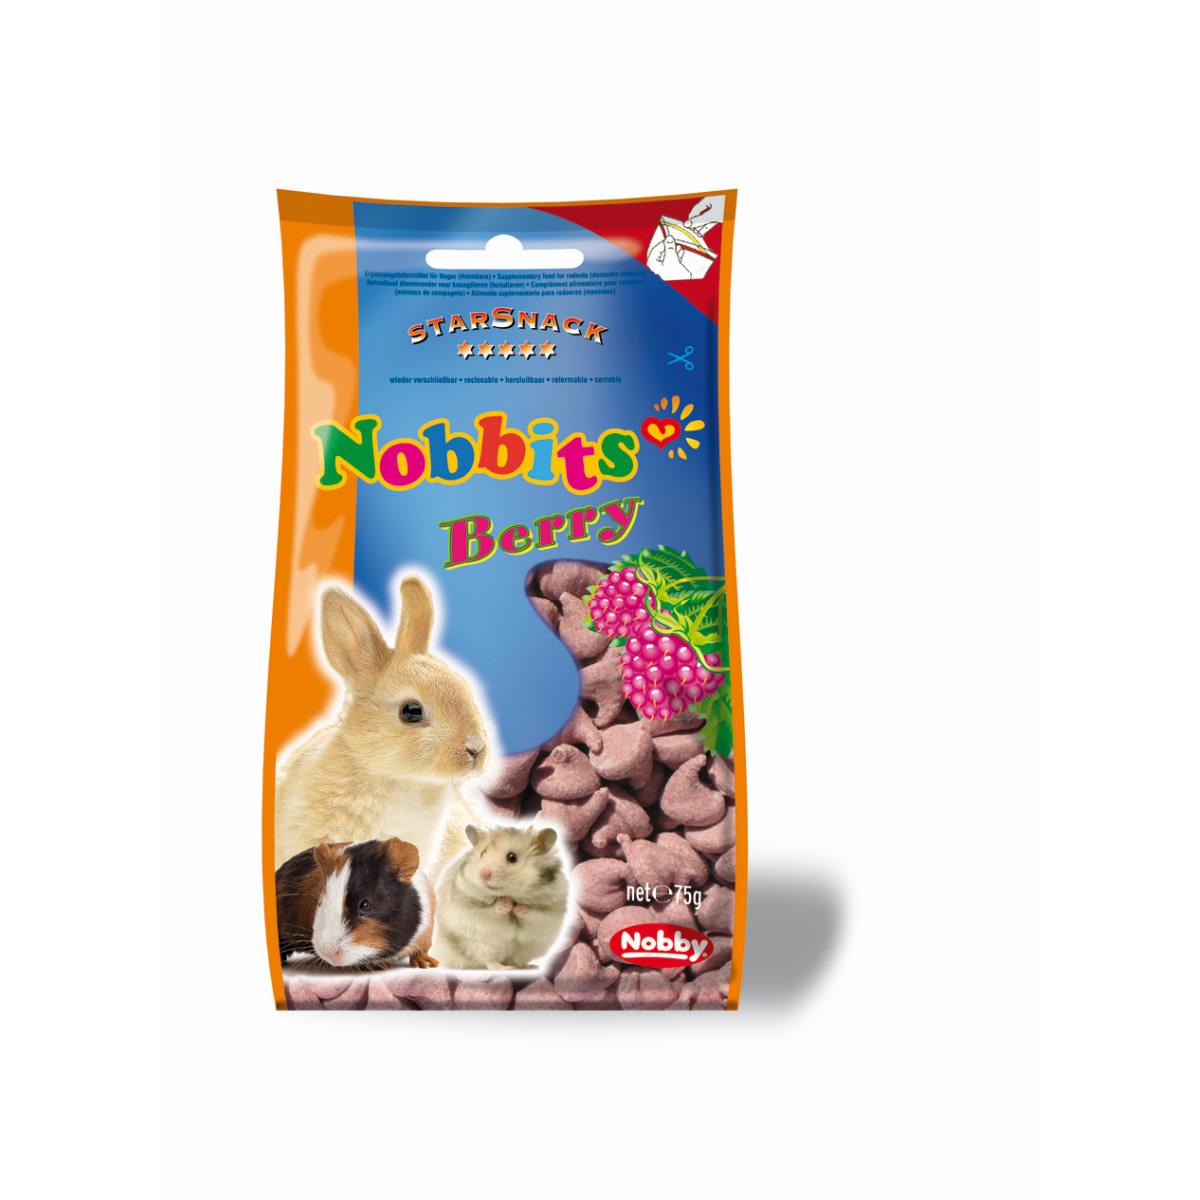 NOBBY NOBBY - NOBBITS BESSEN BOSBESSEN